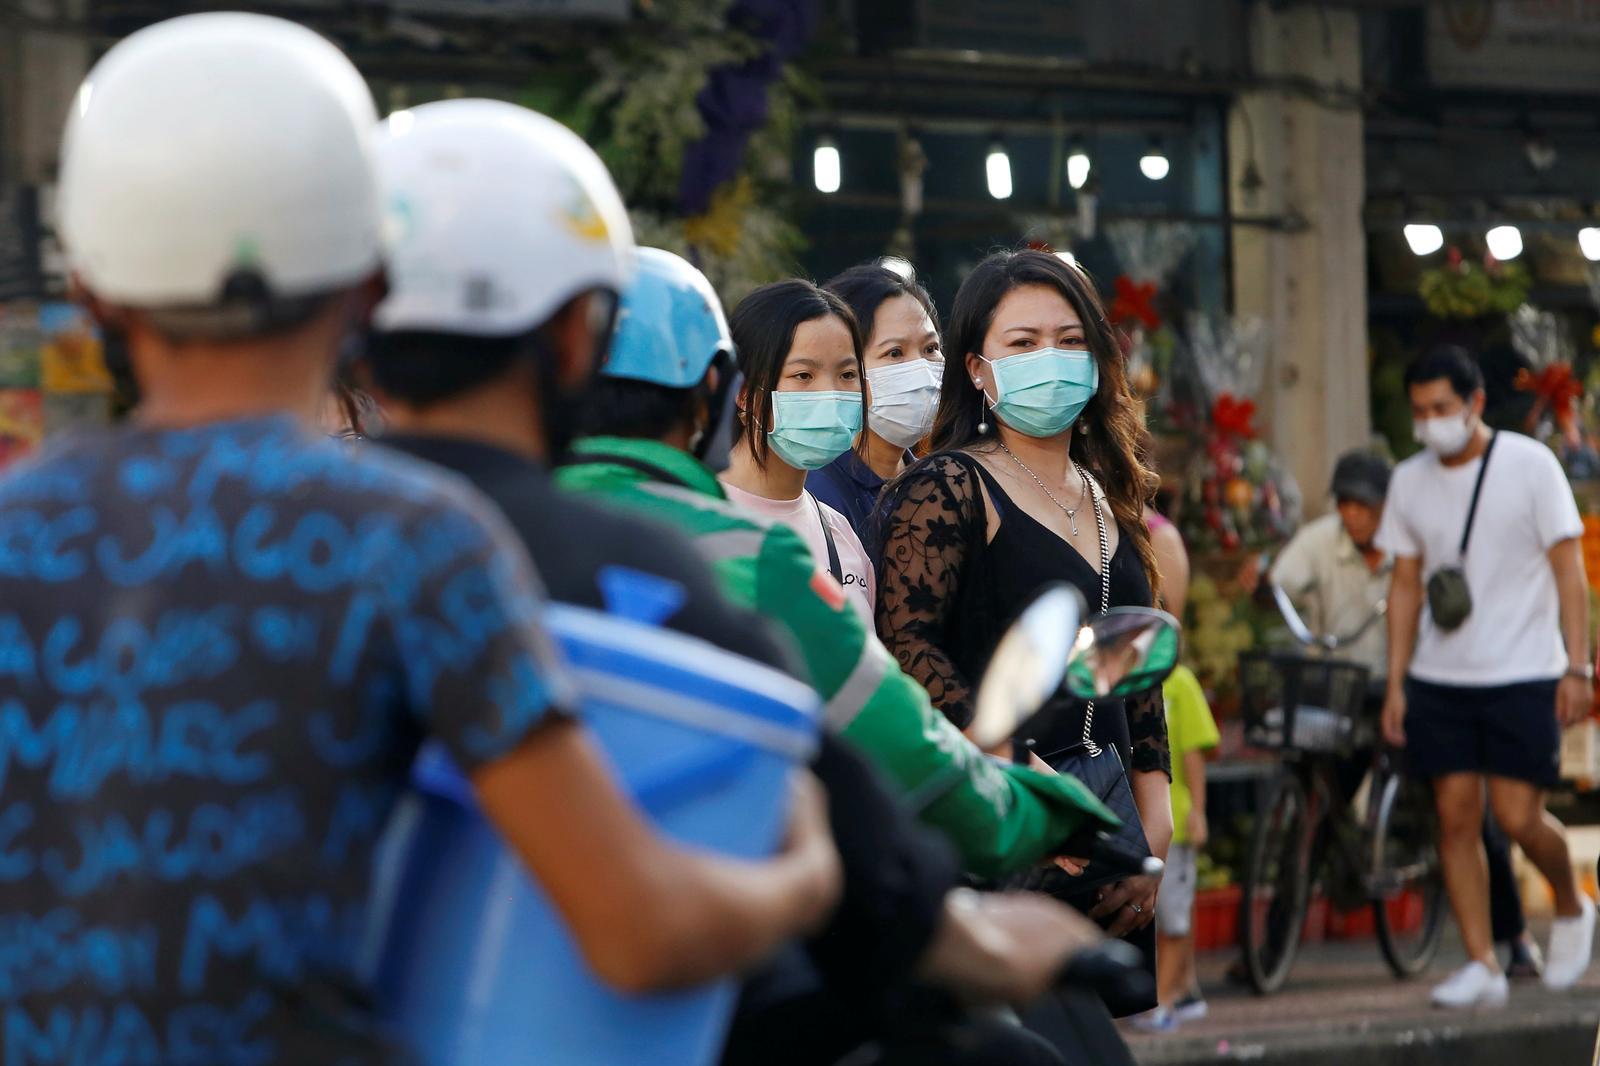 U.S. firms in Vietnam hit by coronavirus supply chain issues: AmCham survey